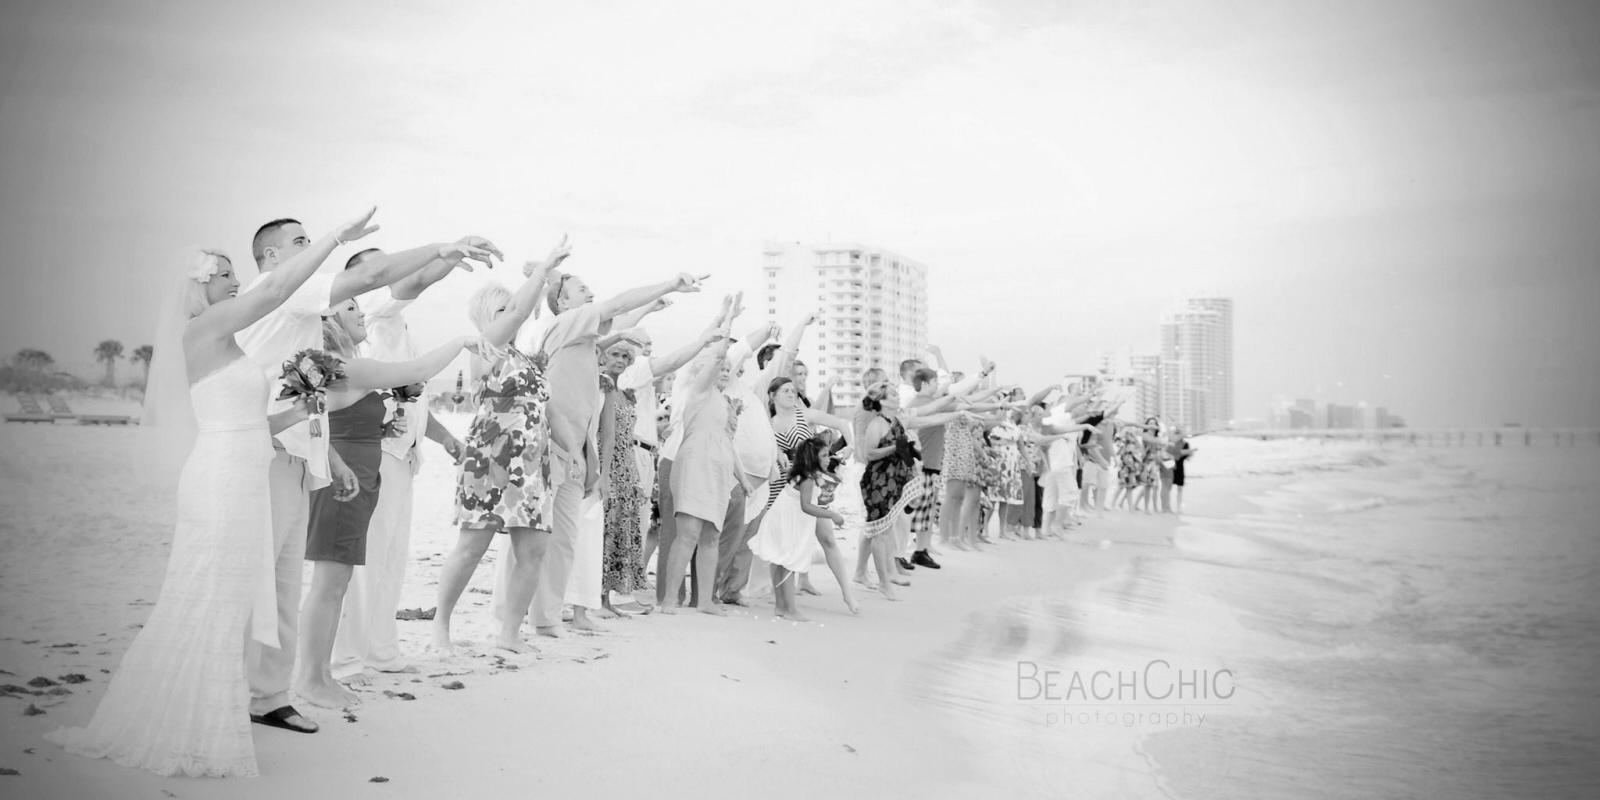 Beach Chic Photography